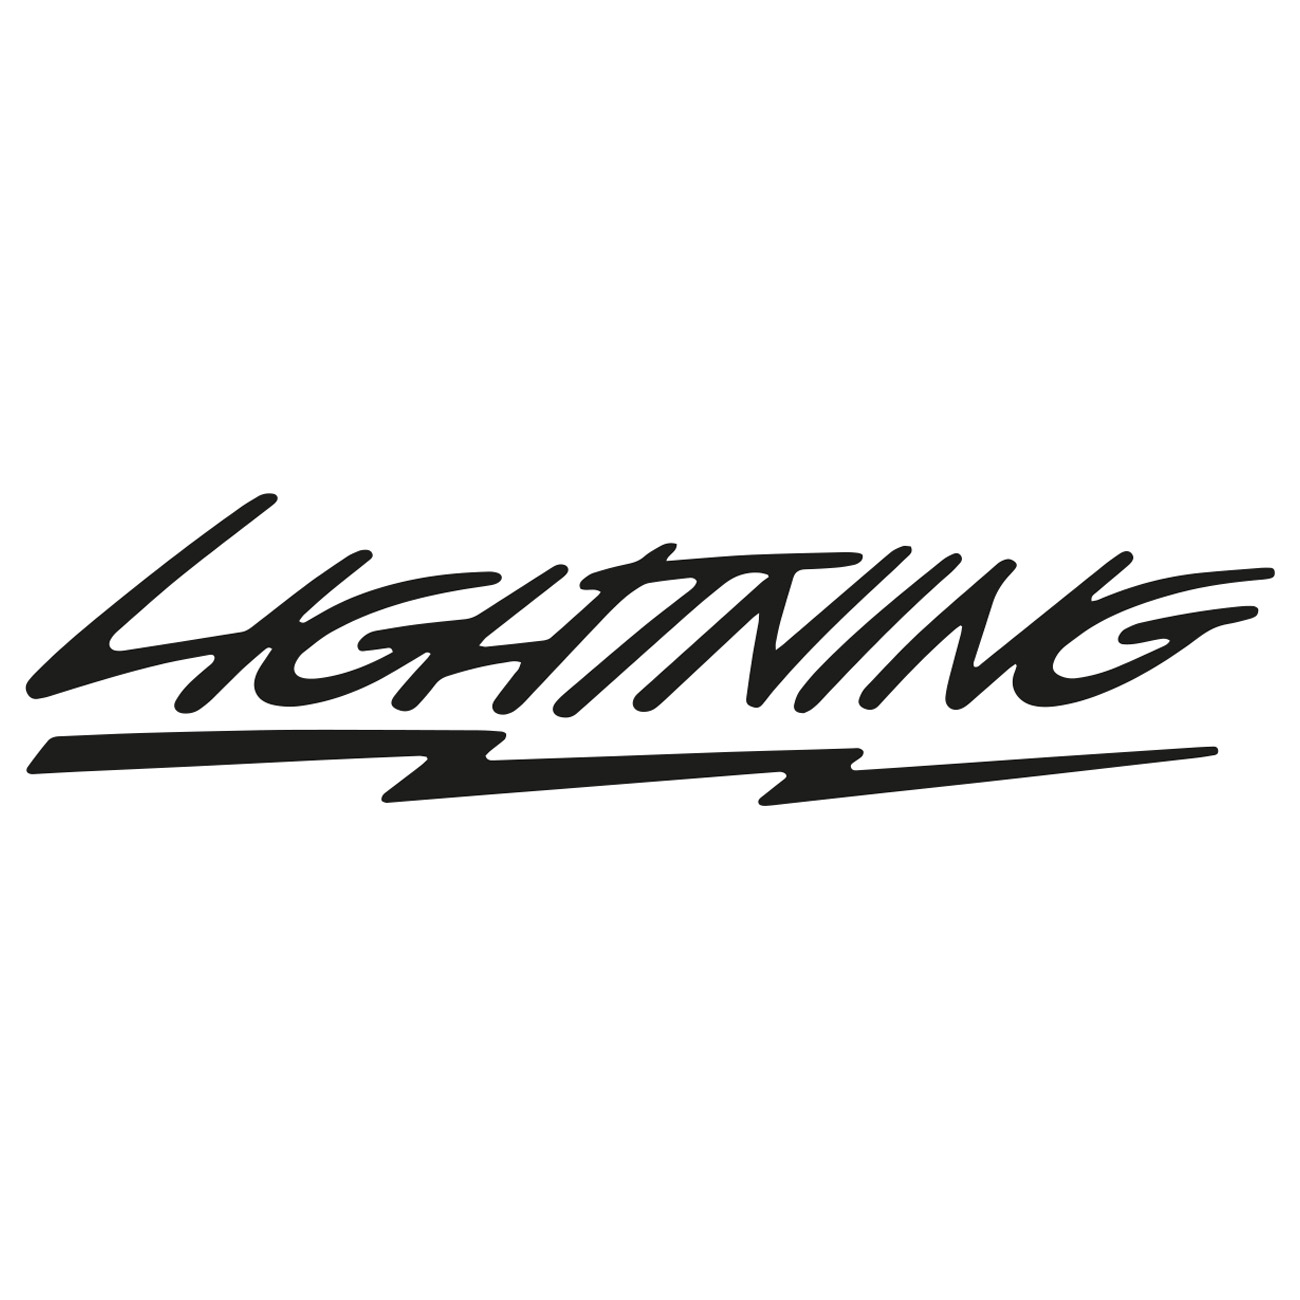 Ford lightning logo